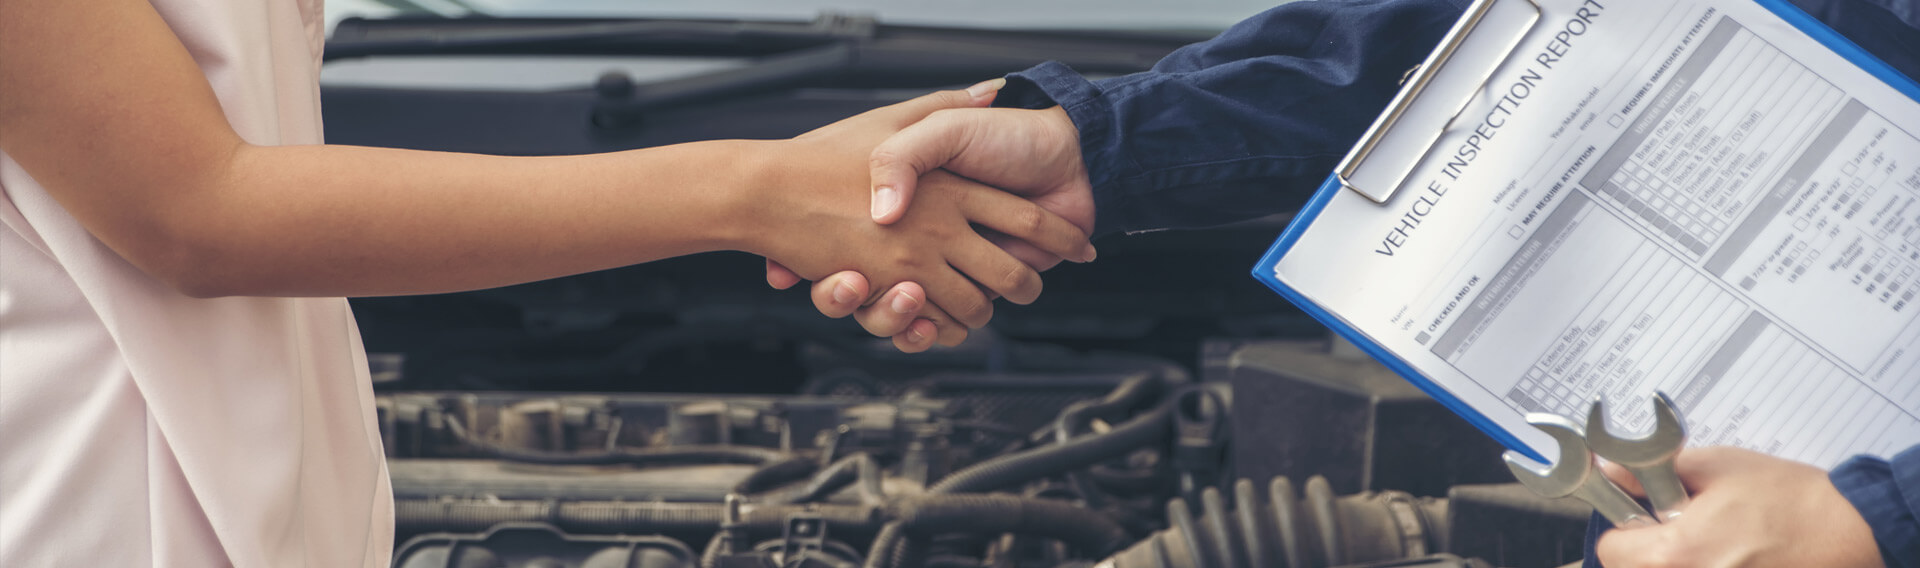 auto repair and maintenance service